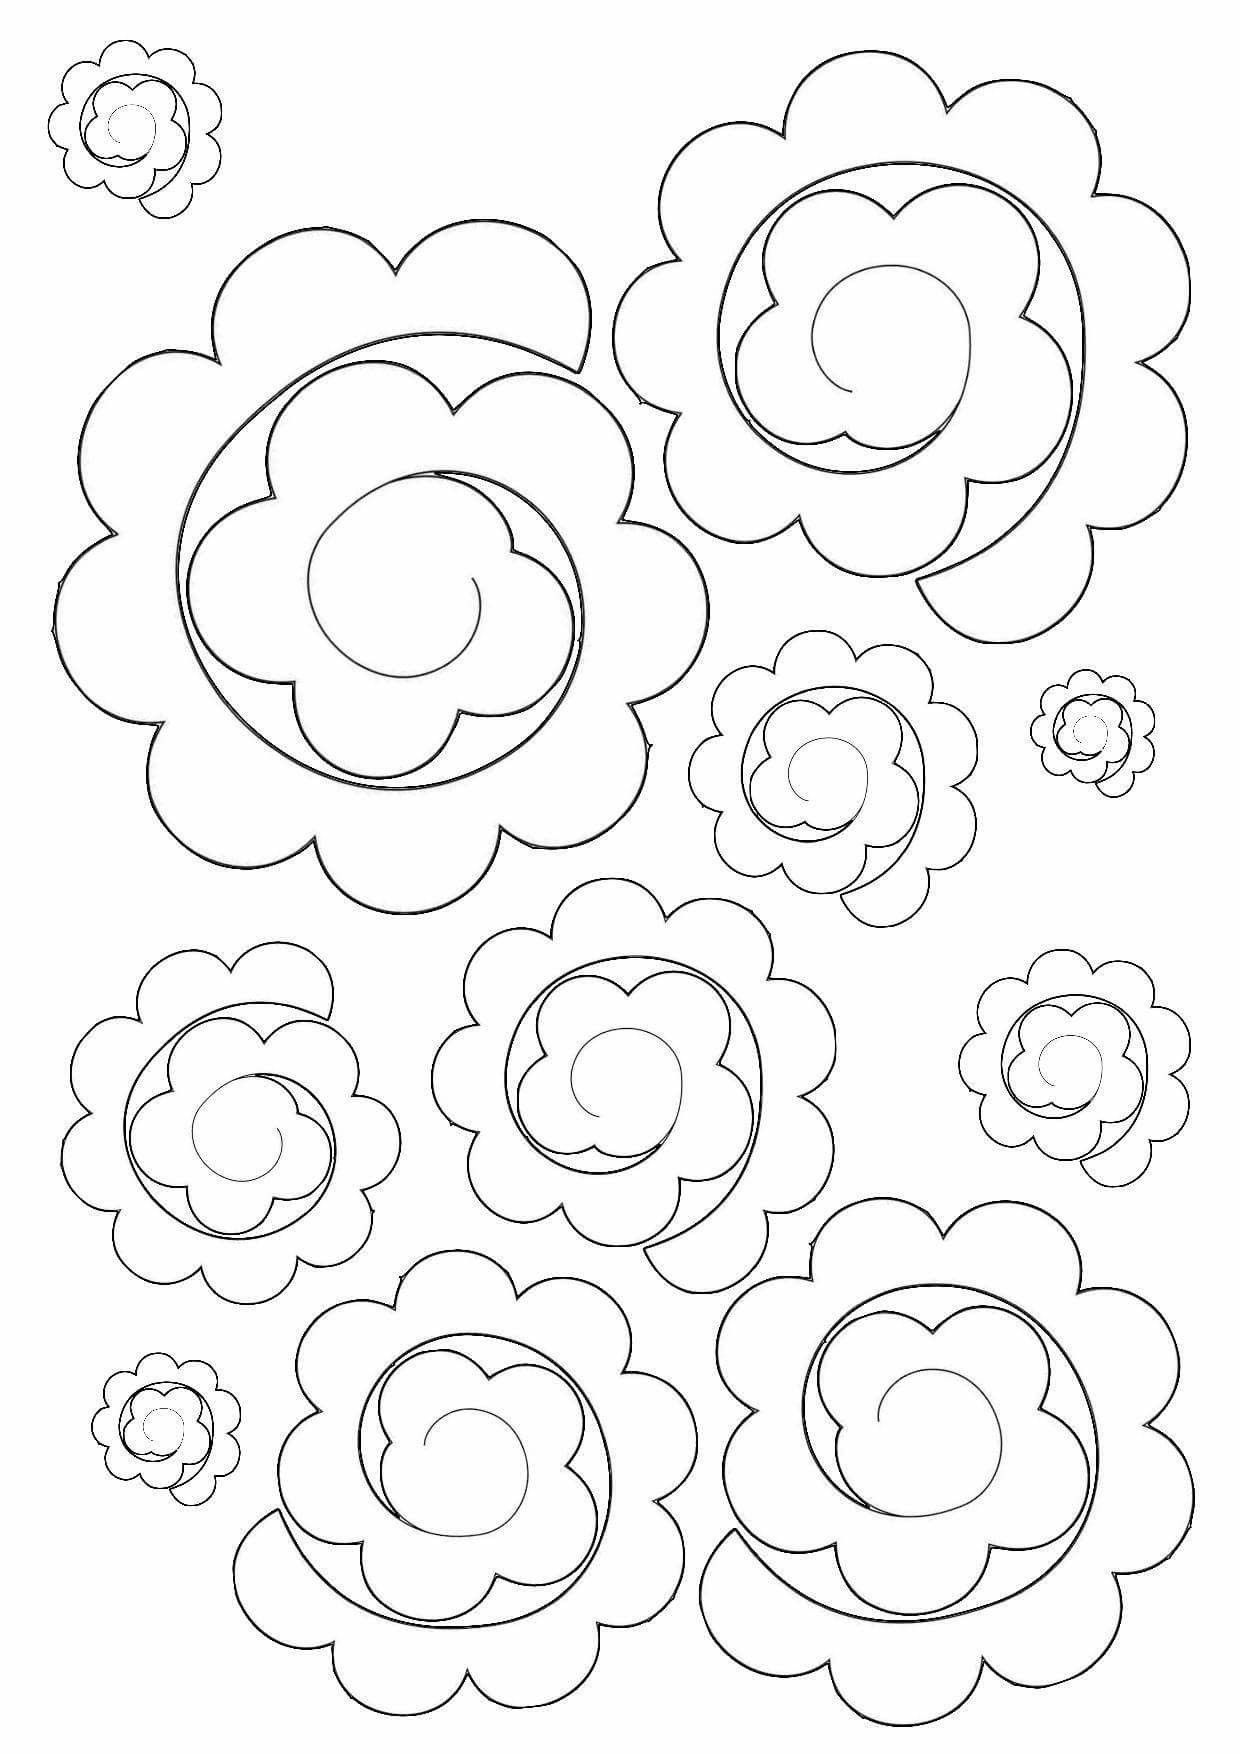 #feltflowertemplate #feltflowertemplate #feltflowertemplate